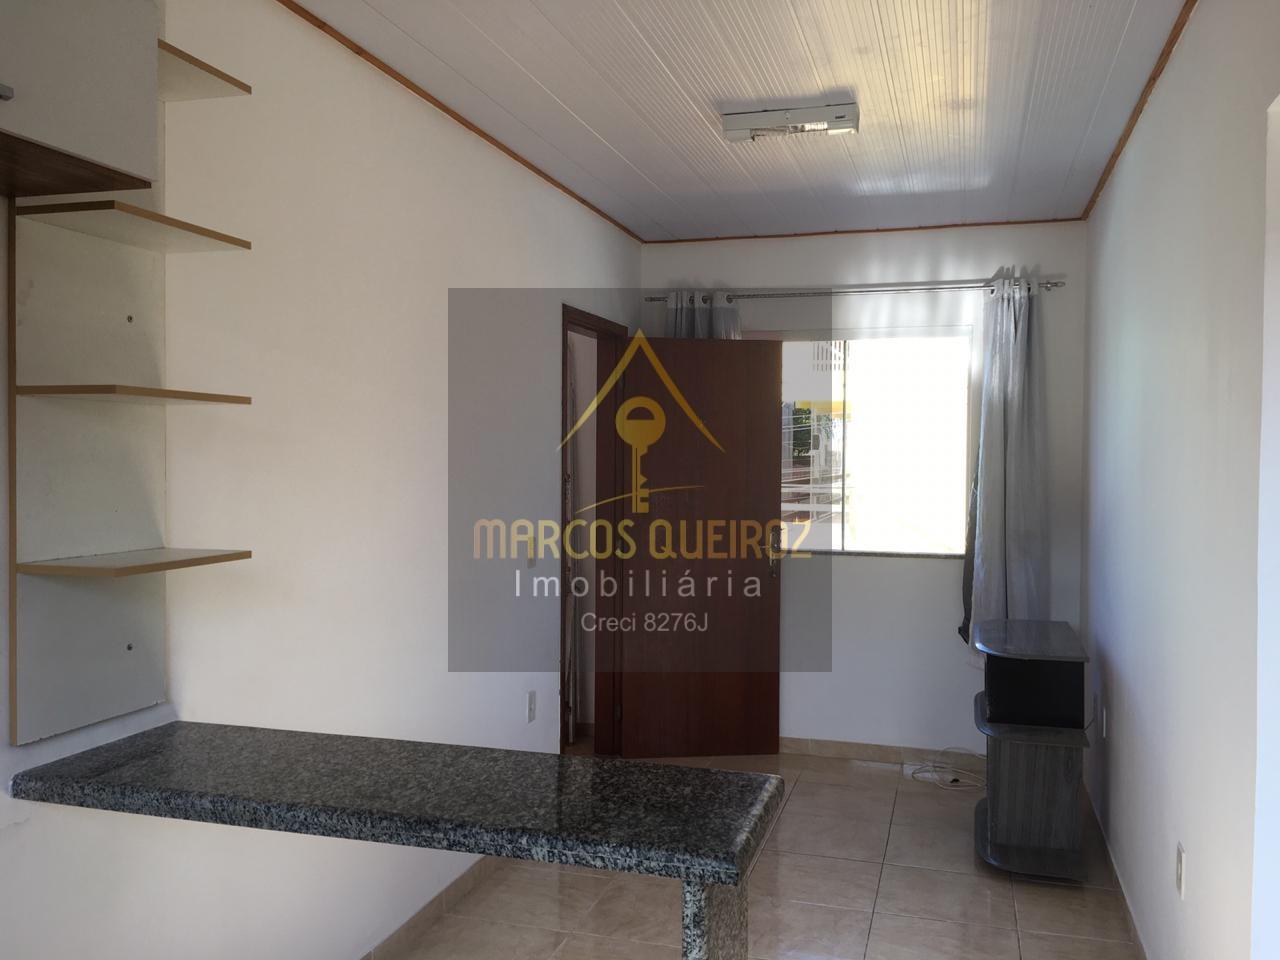 Cod: F90 Imóvel disponivel para aluguel fixo no bairro Peró